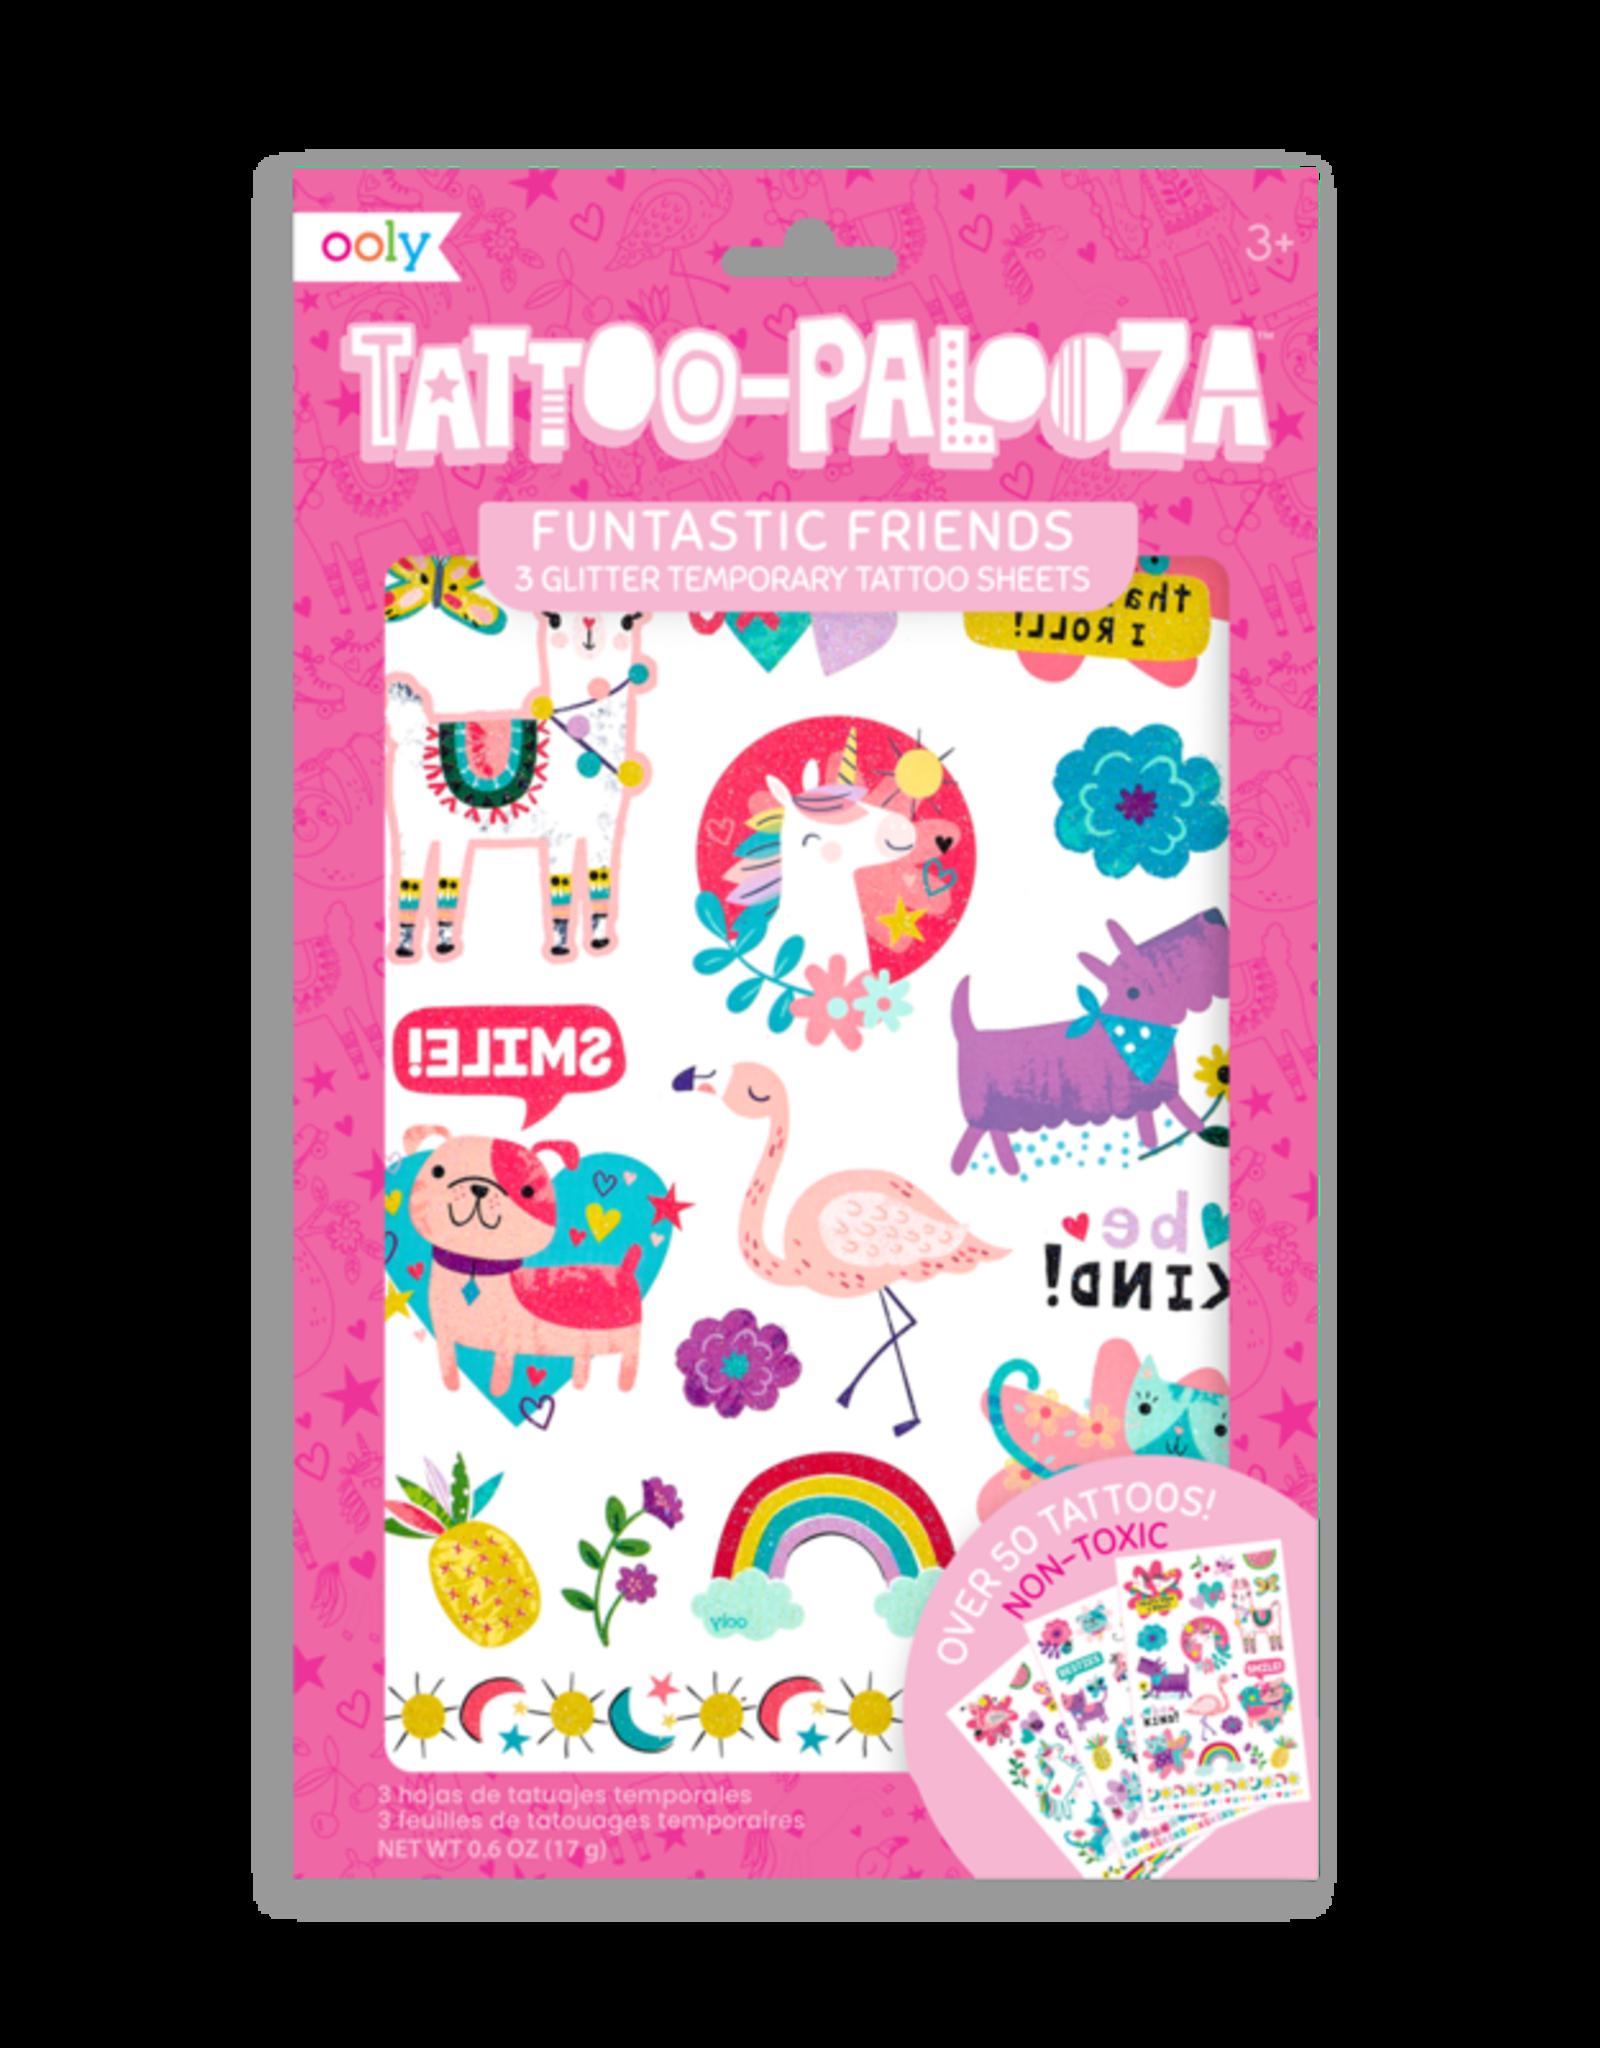 Ooly Tattoo Palooza